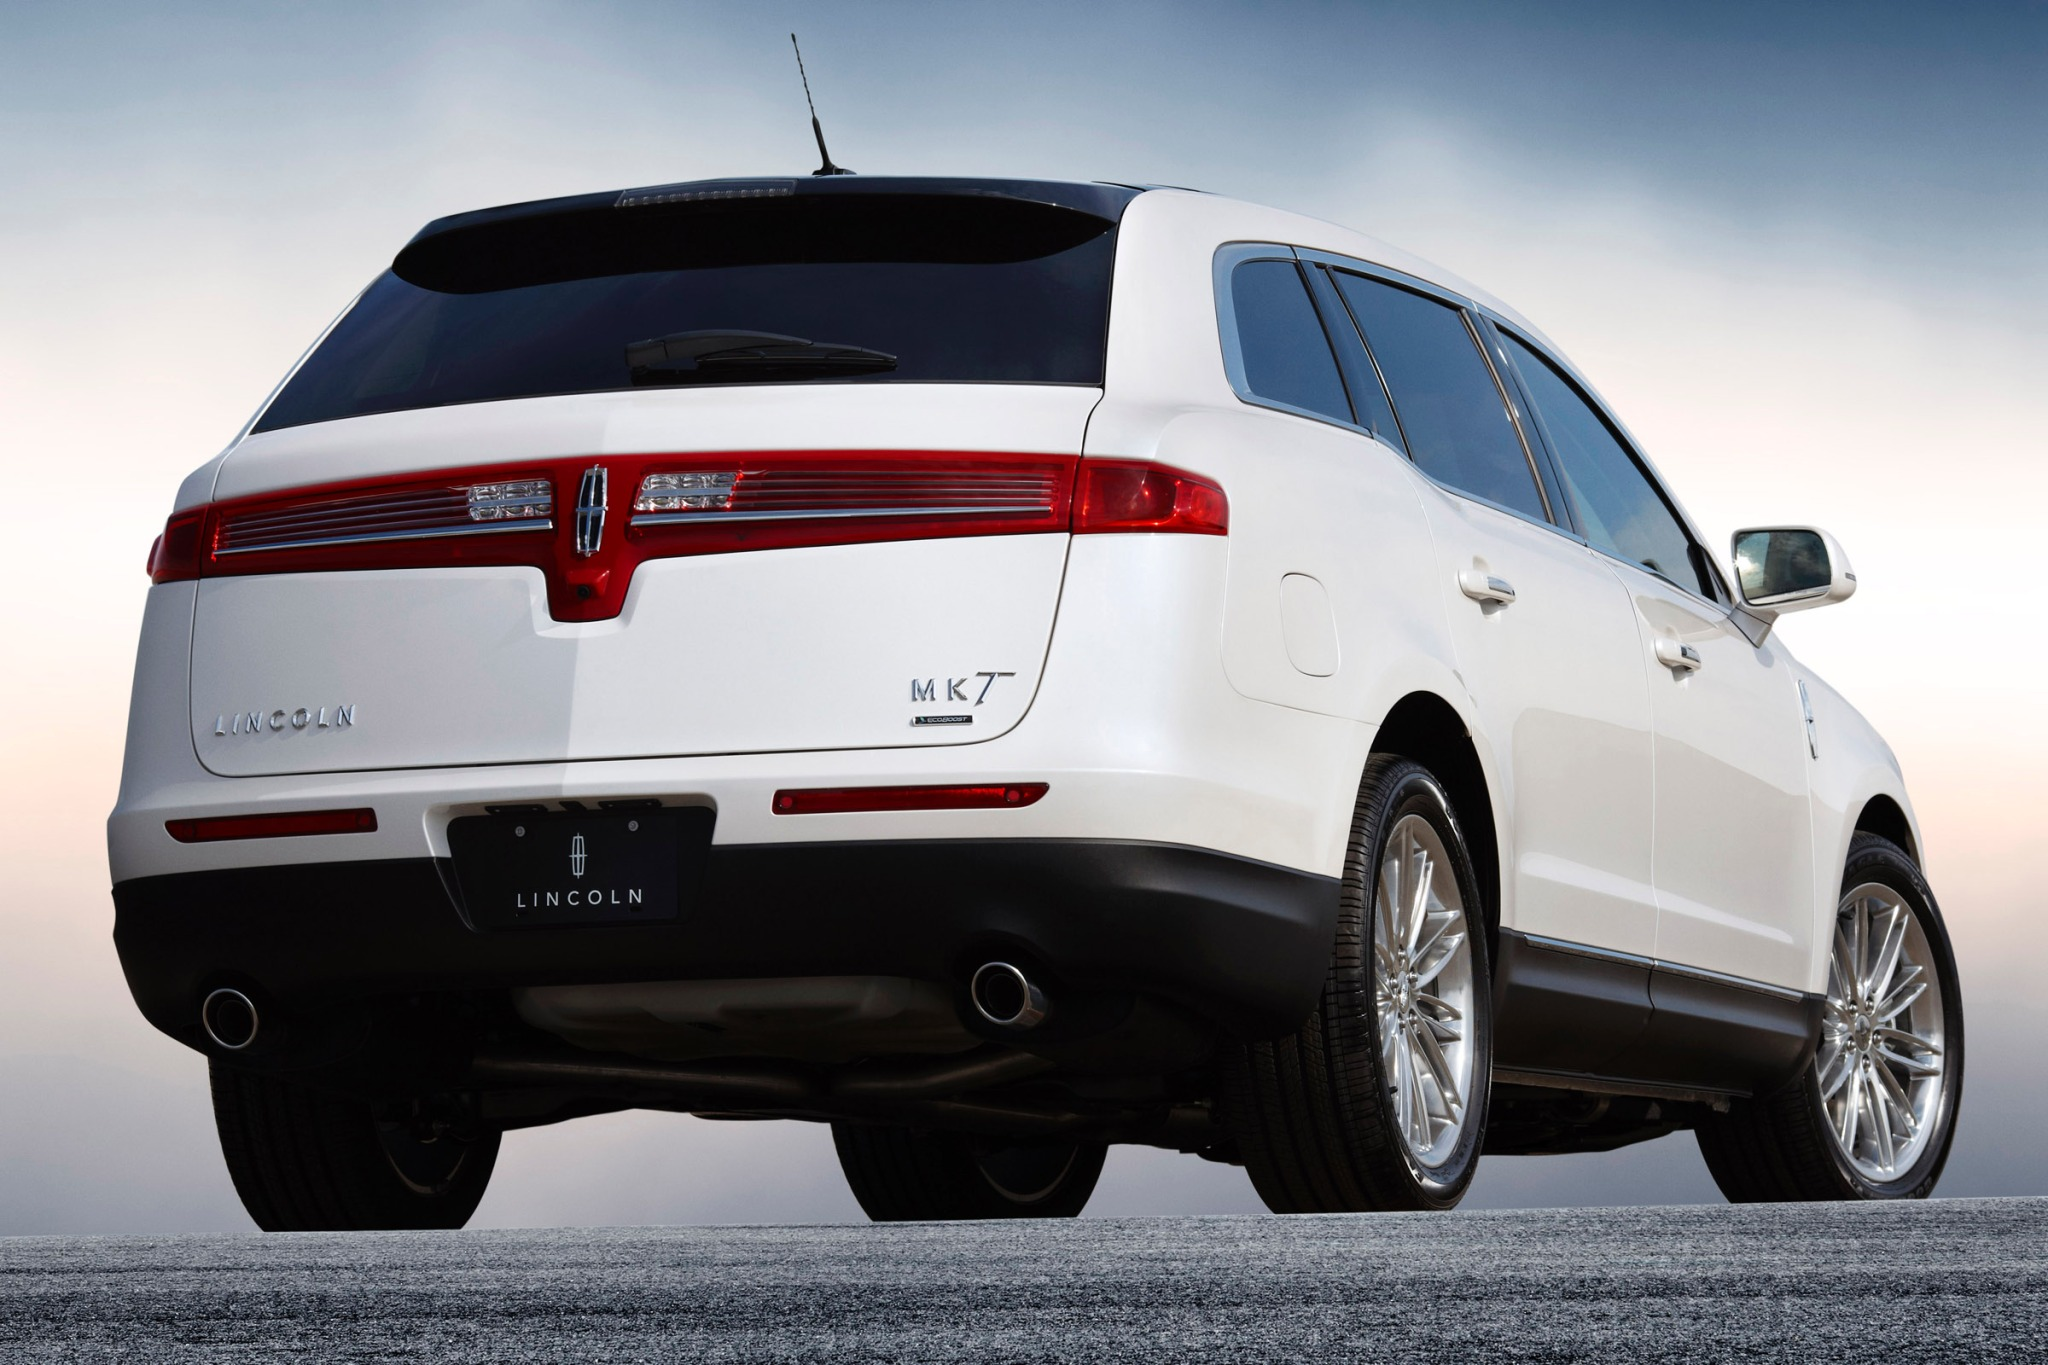 2014 Lincoln Mkt Image 6